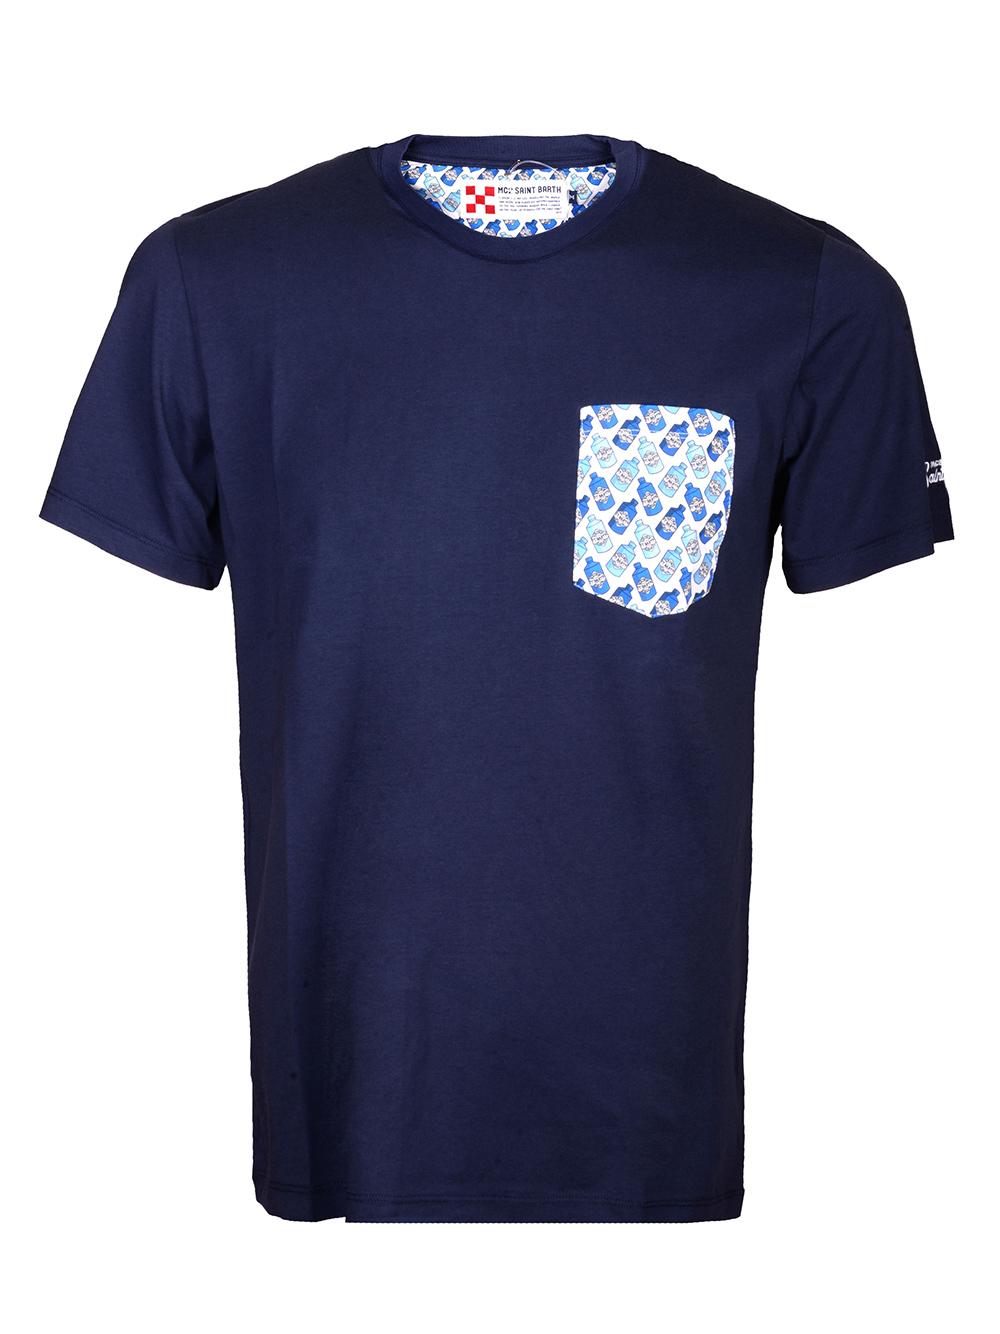 Mc2 St.BarthSALT WATER Μπλούζα t-shirt BLANCHE ΜΠΛΕ